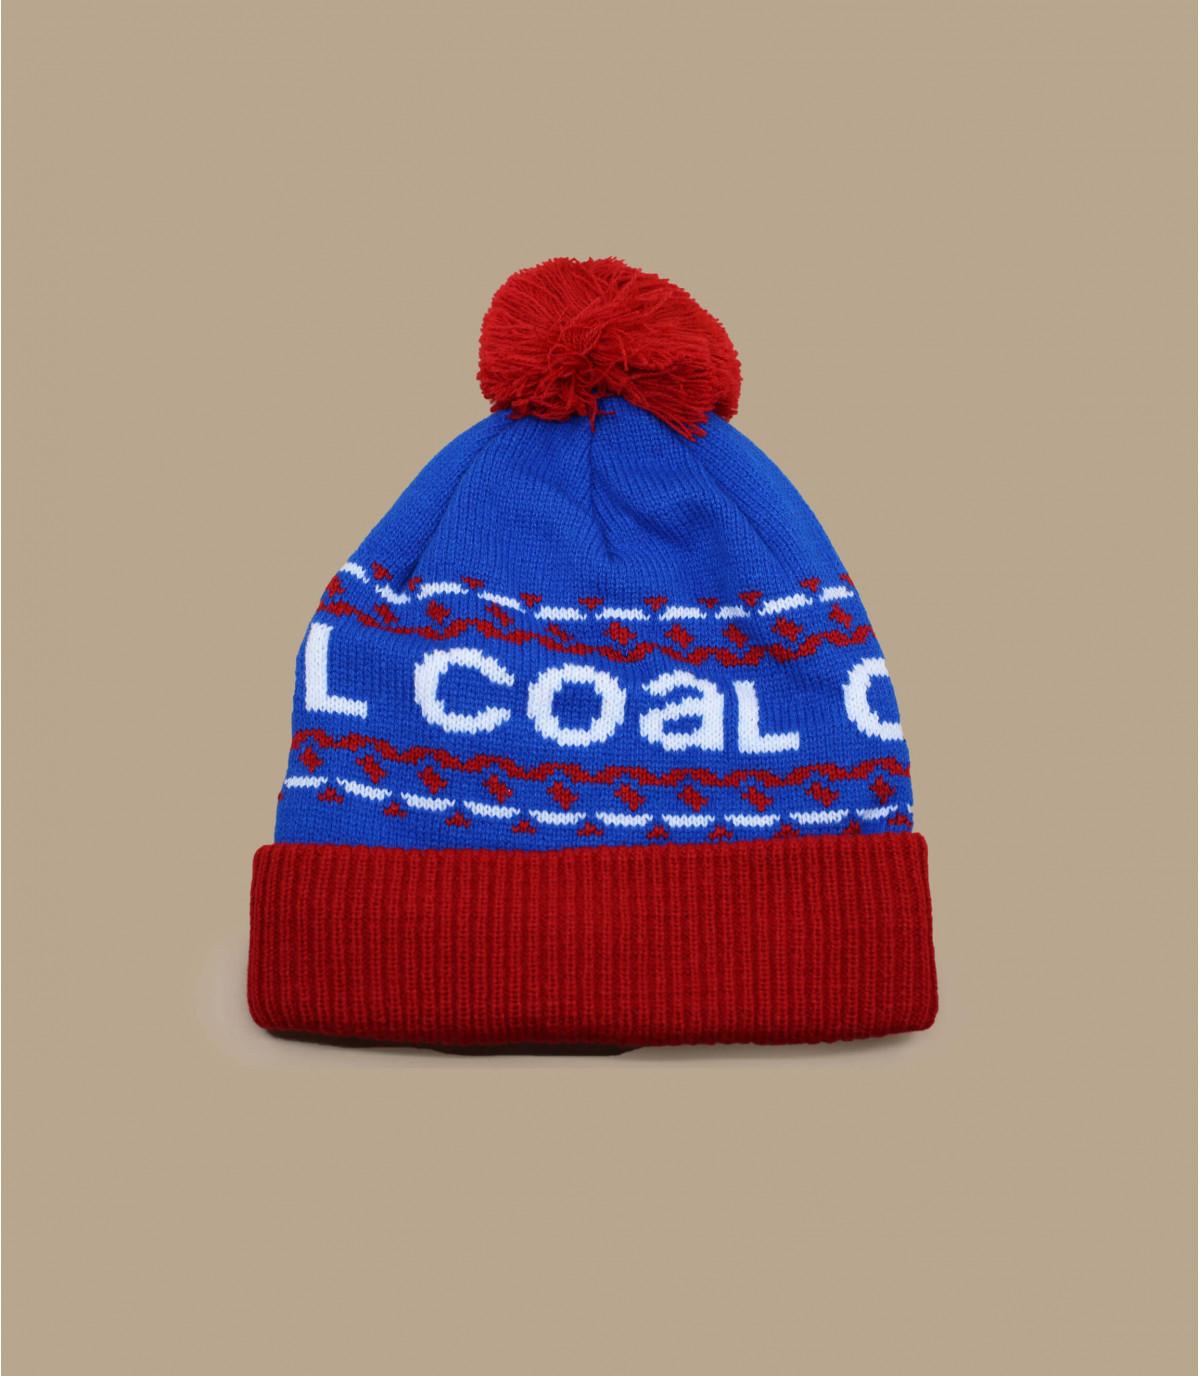 Vintage coal beanie